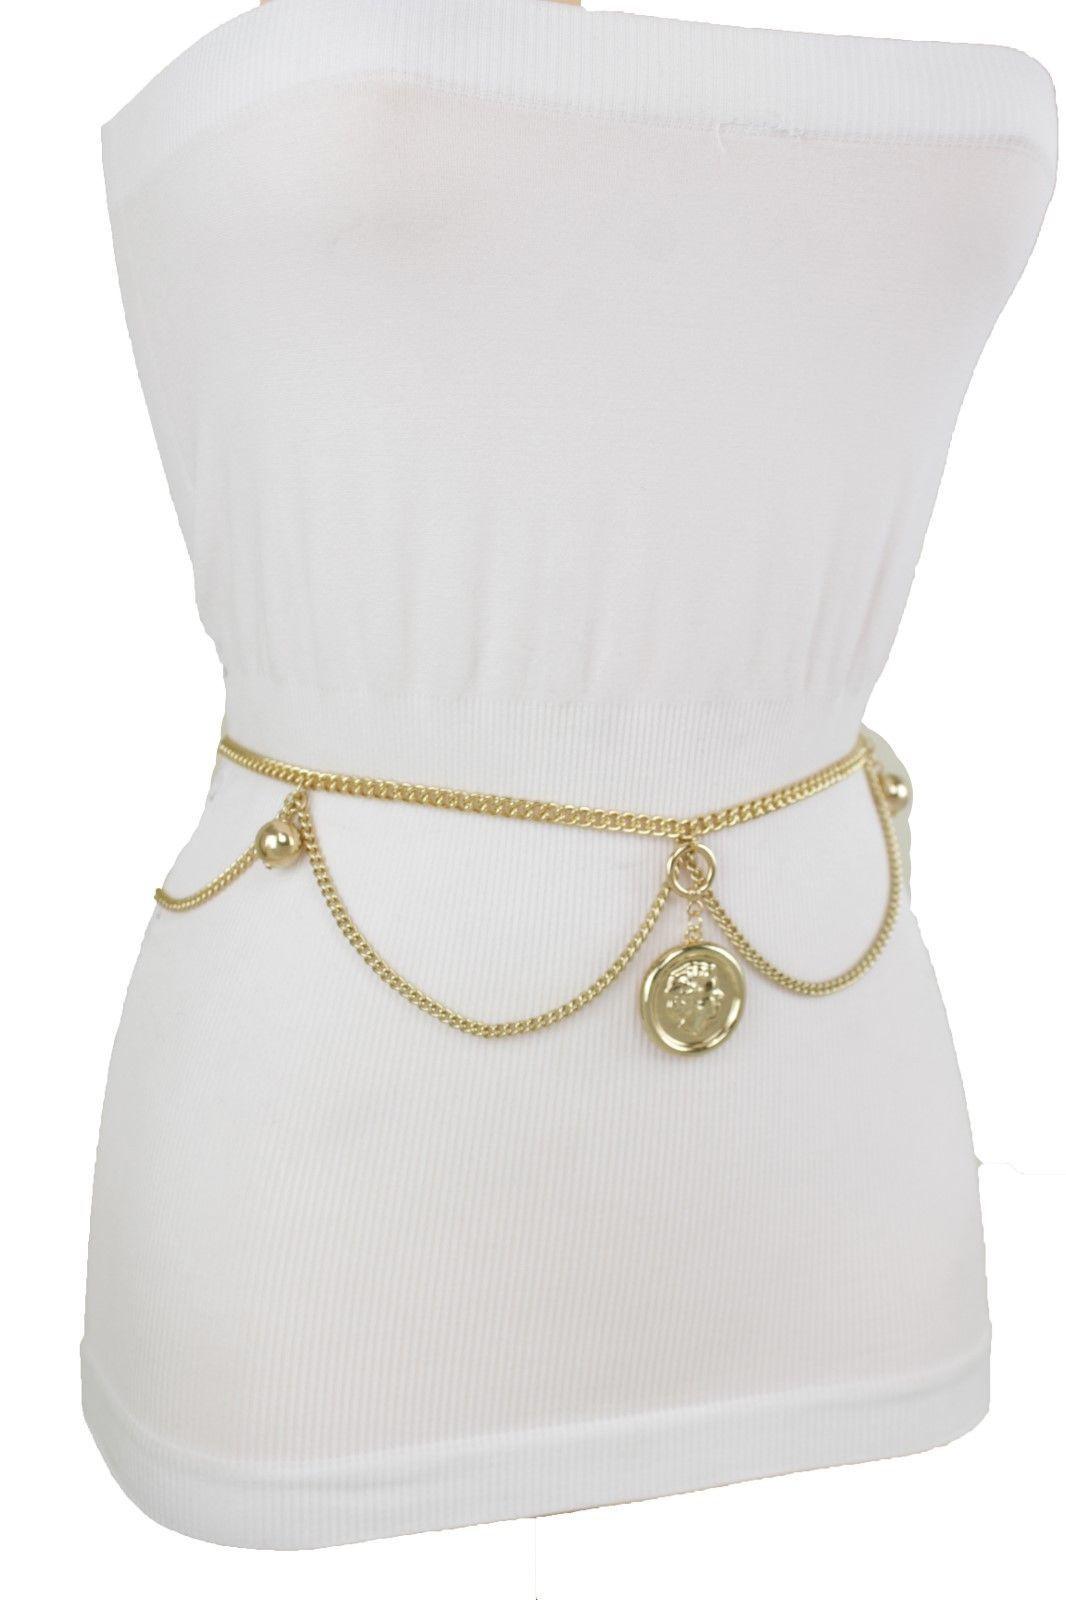 Women Skinny Belt Fashion Gold Metal Chain Link Coin Ball Charm Size XS S M L XL